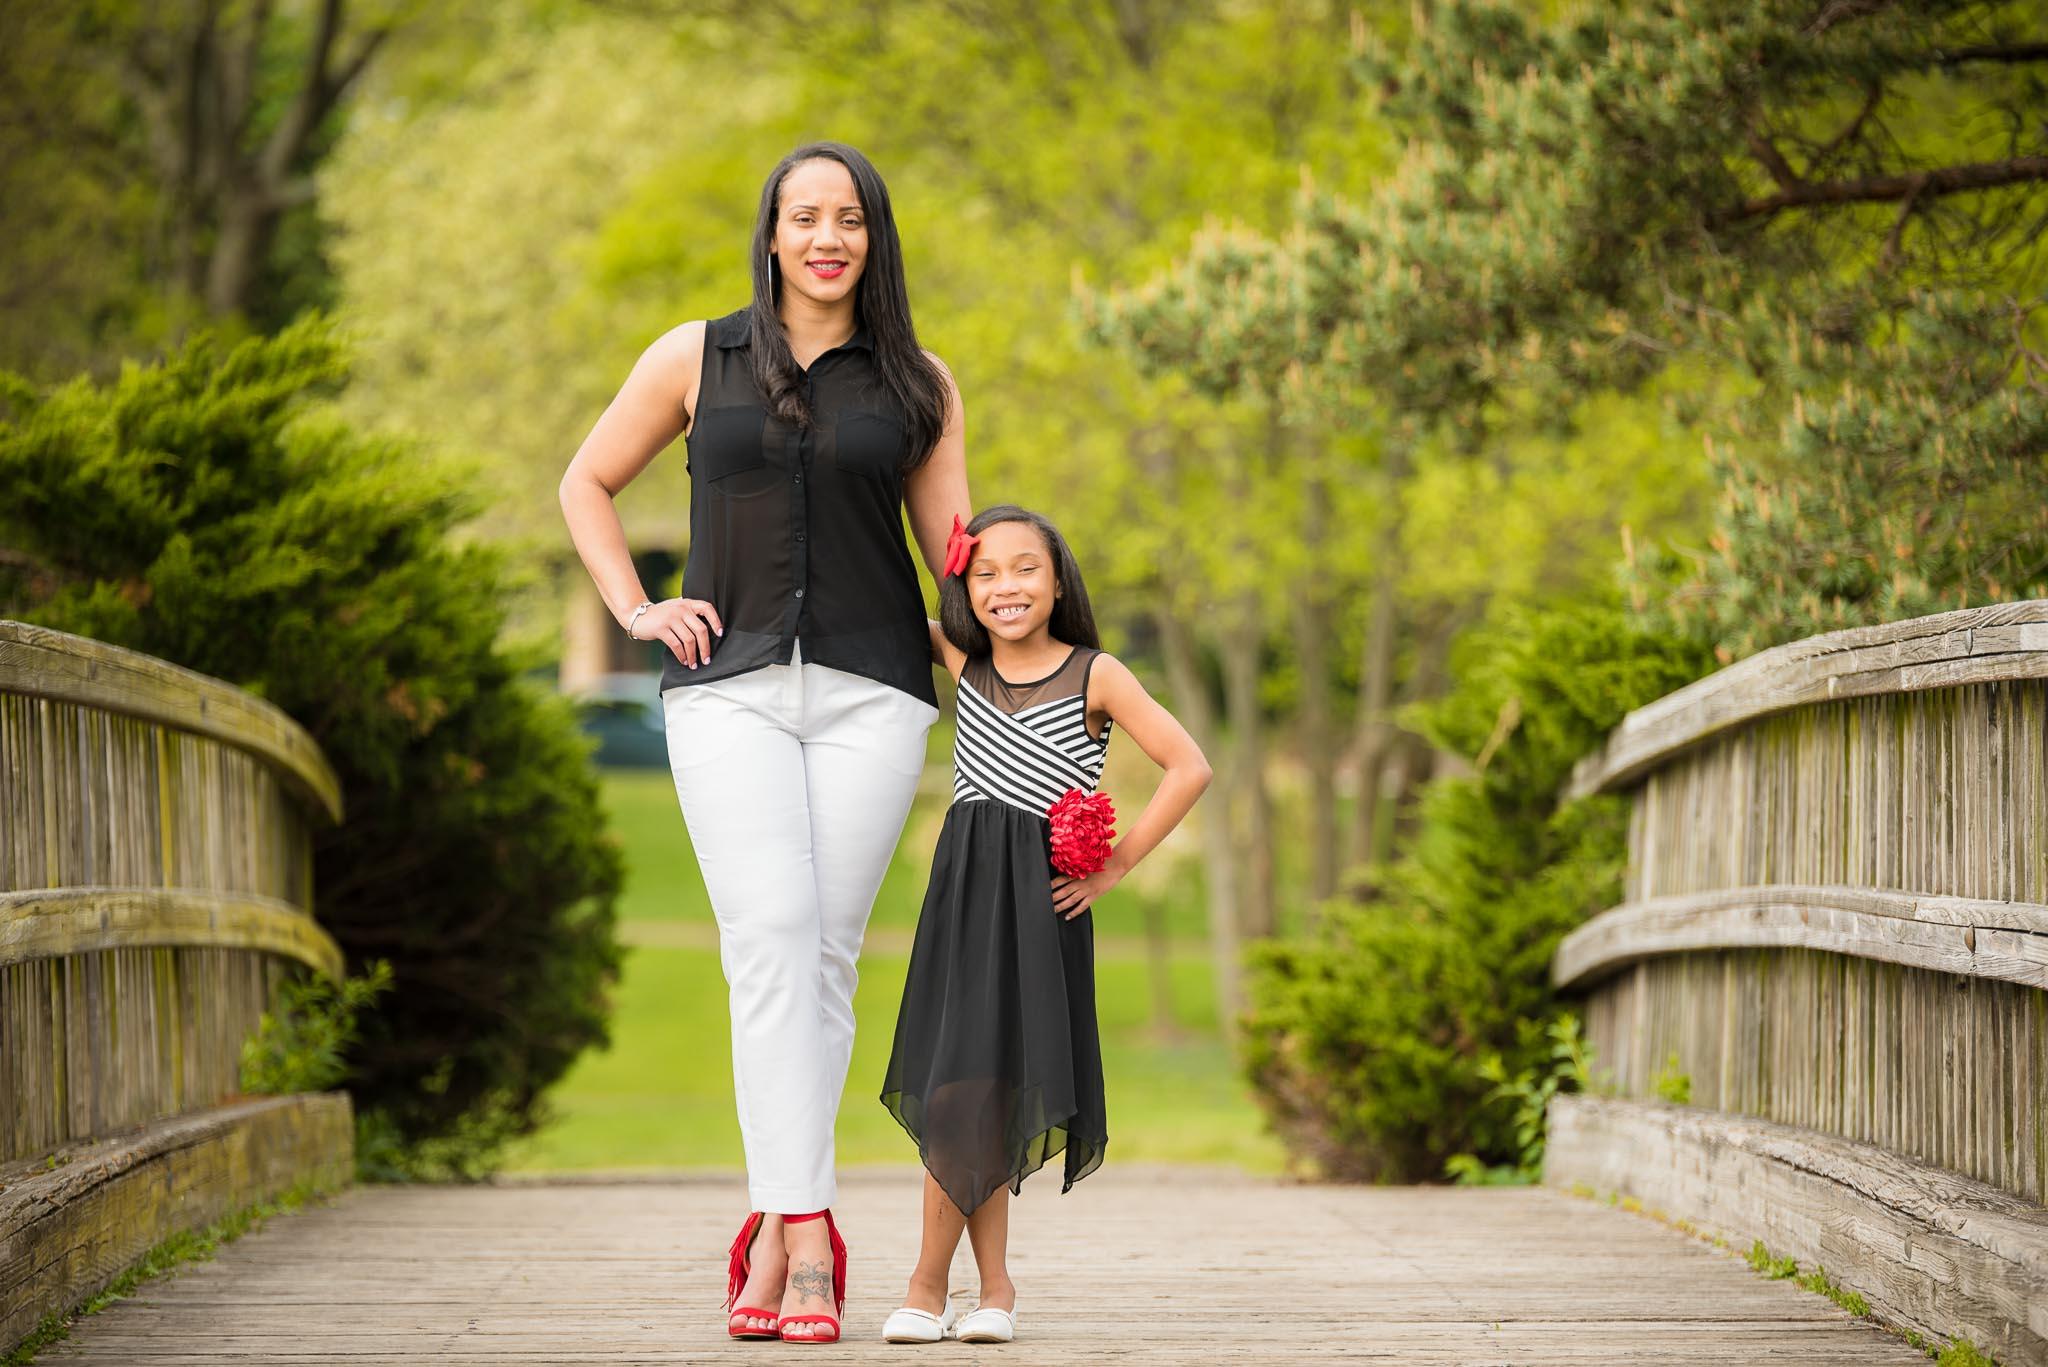 Grandma-Granddaughter Photos - Vision & Style Photography